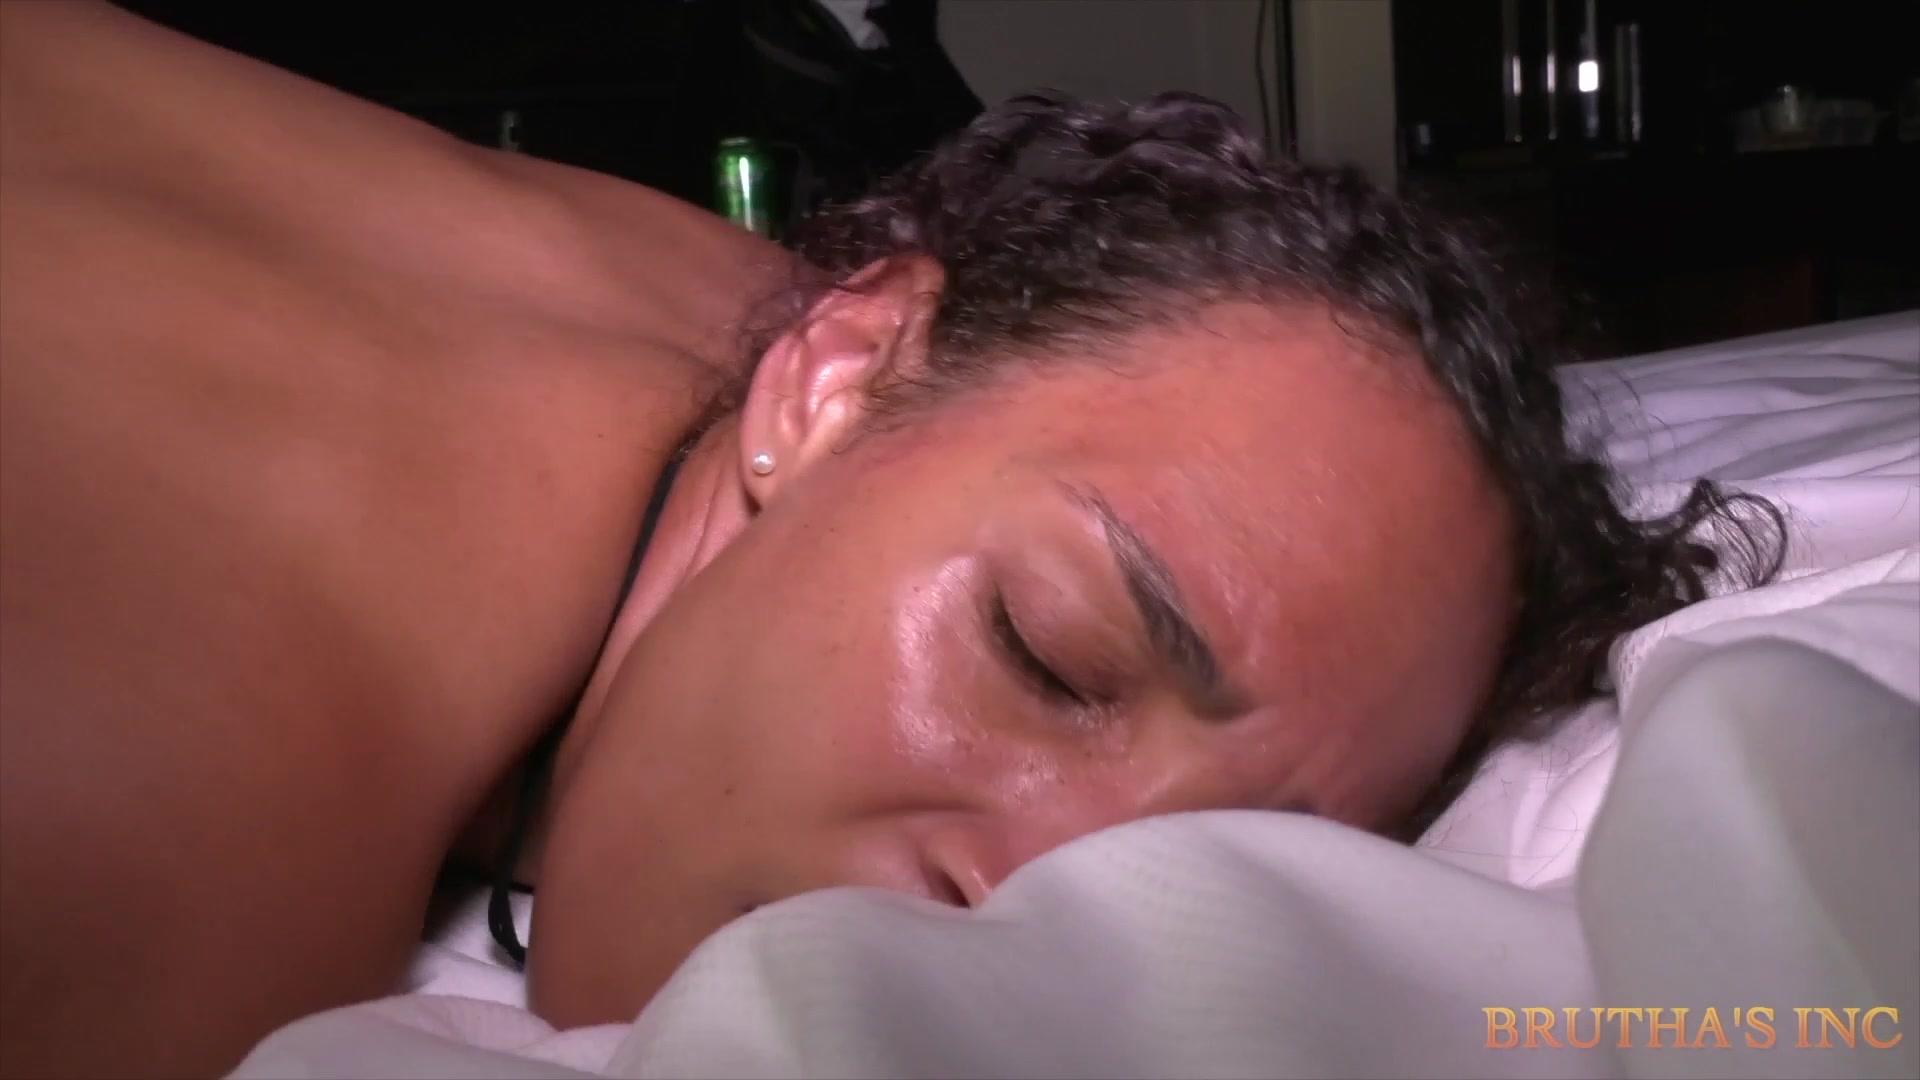 big black ass movie vol. 2, the (2017) videos on demand | adult dvd